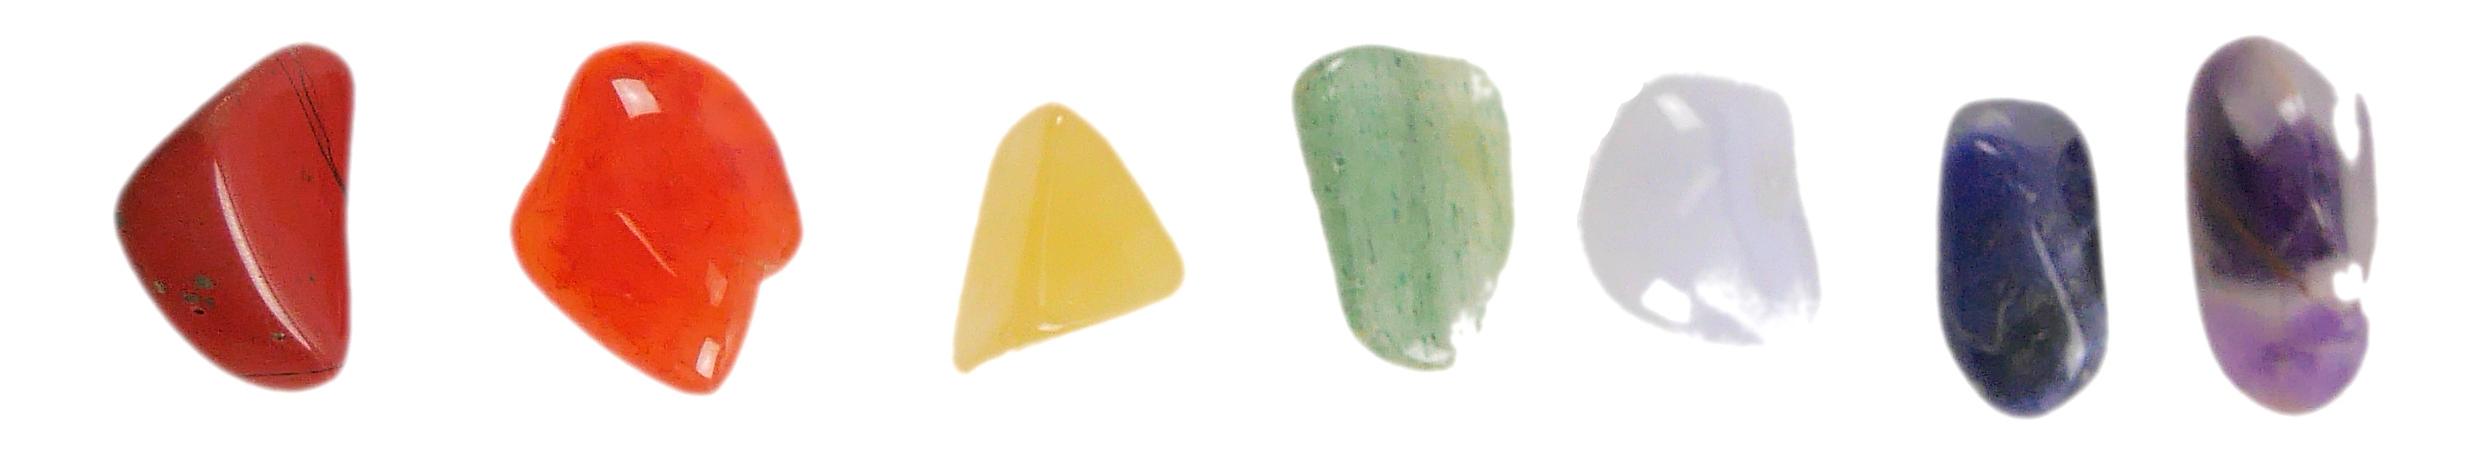 7 chakras pierres lithothérapie coco papaya